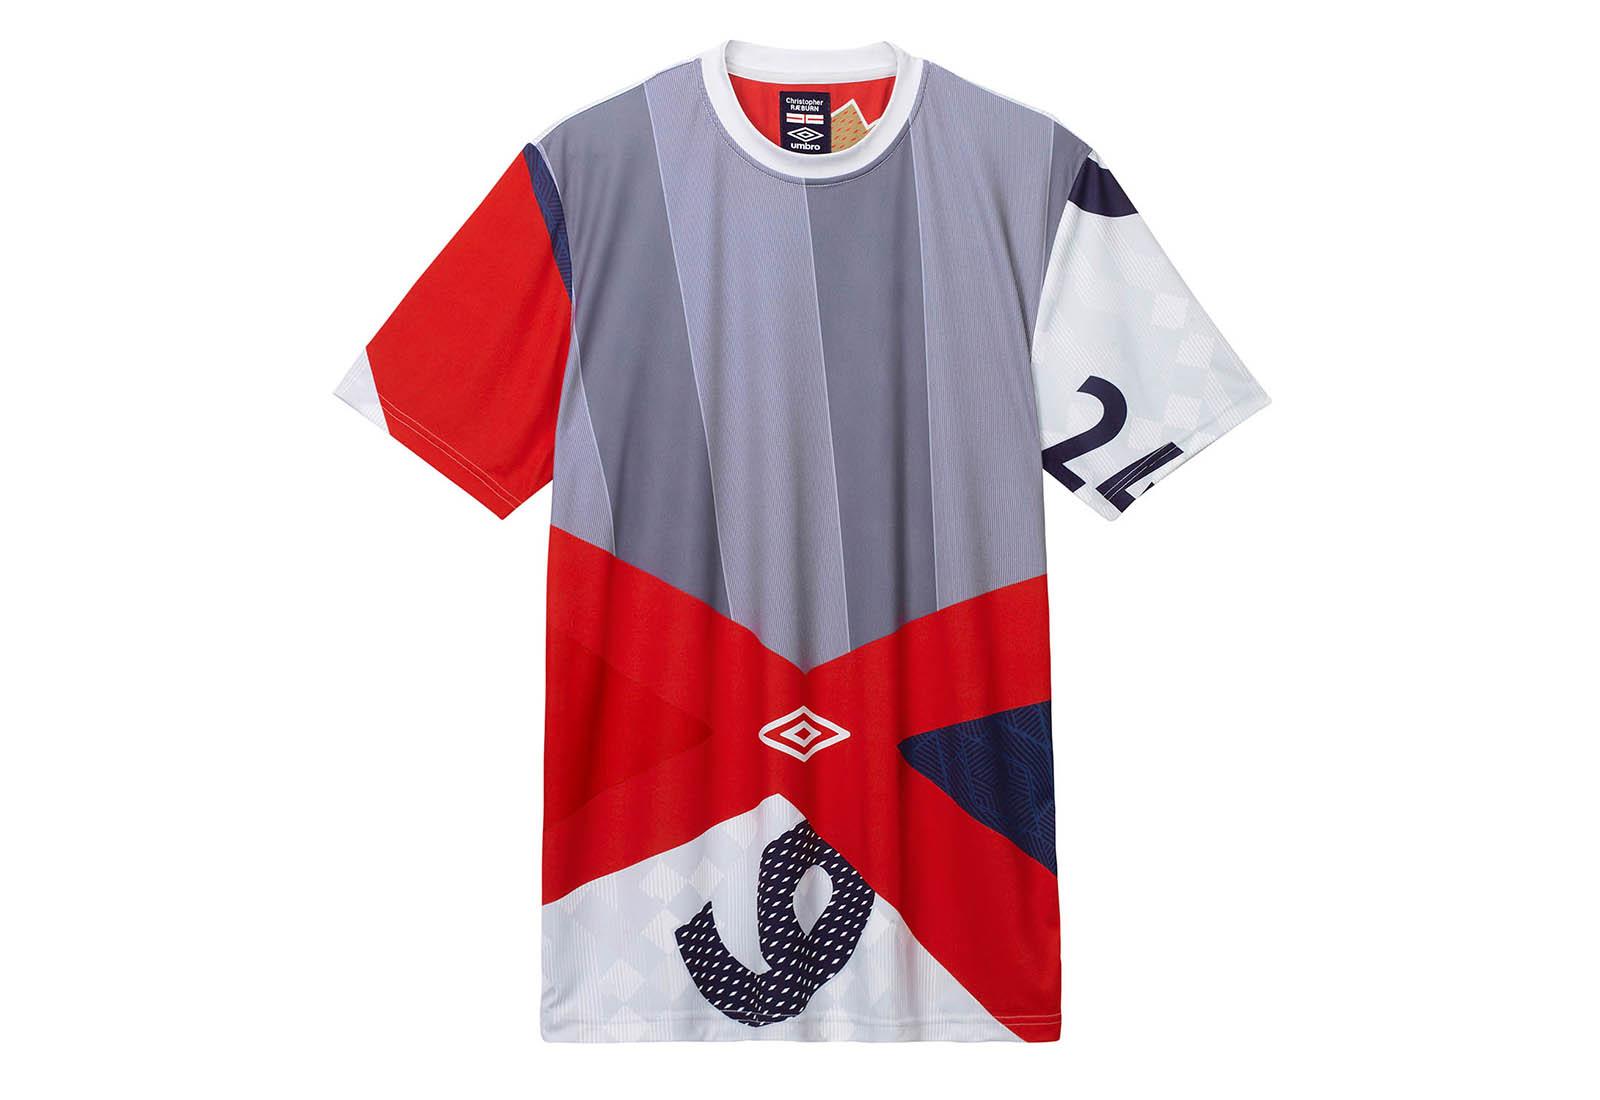 christopher-raeburn-umbro-collaboration-soccerbible-full-collection_0002_umbro-x-christopher-raeburn-remix-tee-red